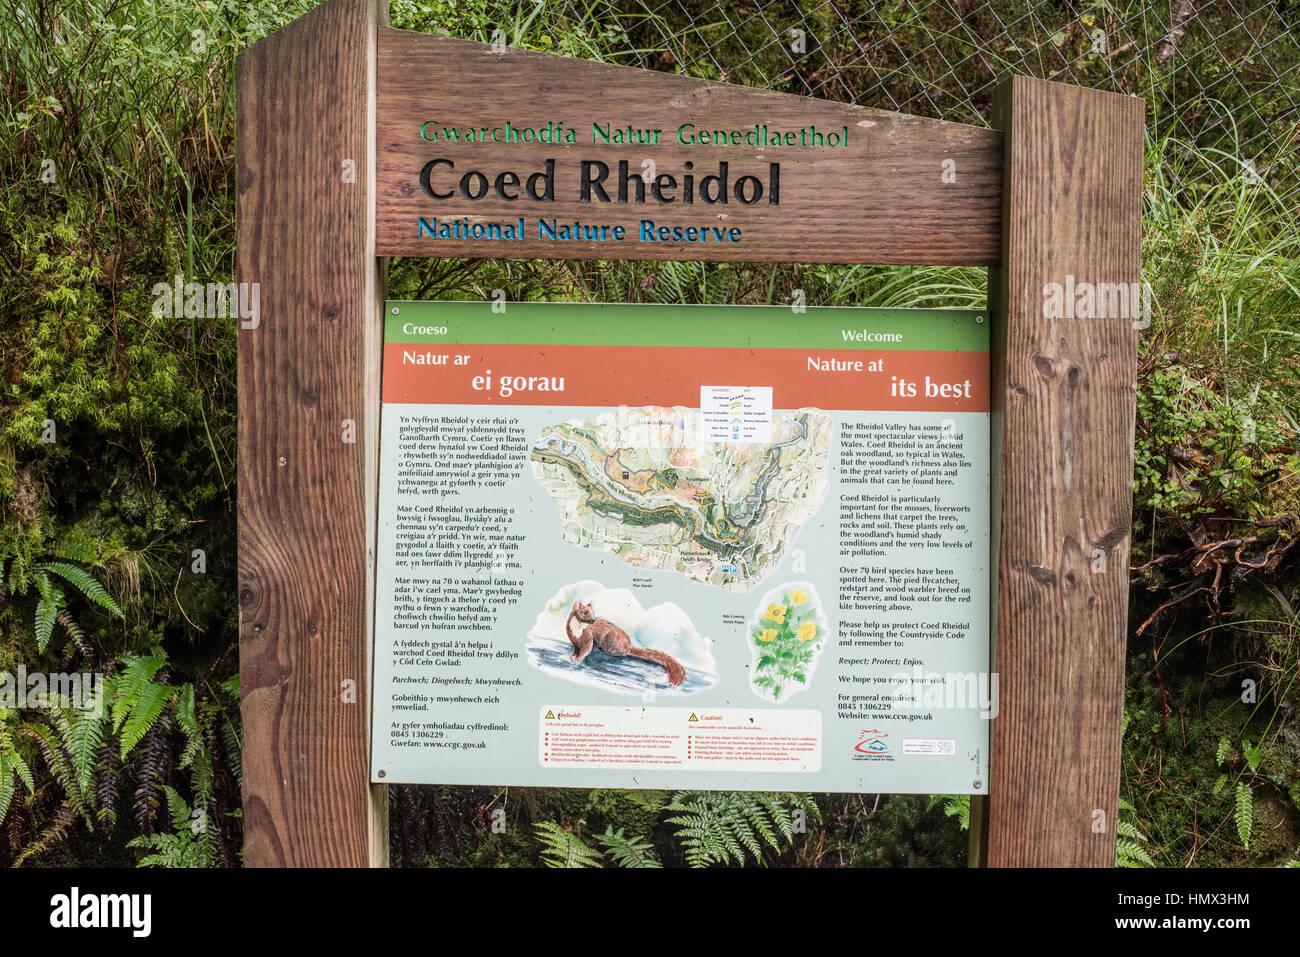 Information board at Coed Rheidol nature reserve, Ceredigion, Wales Stock Photo